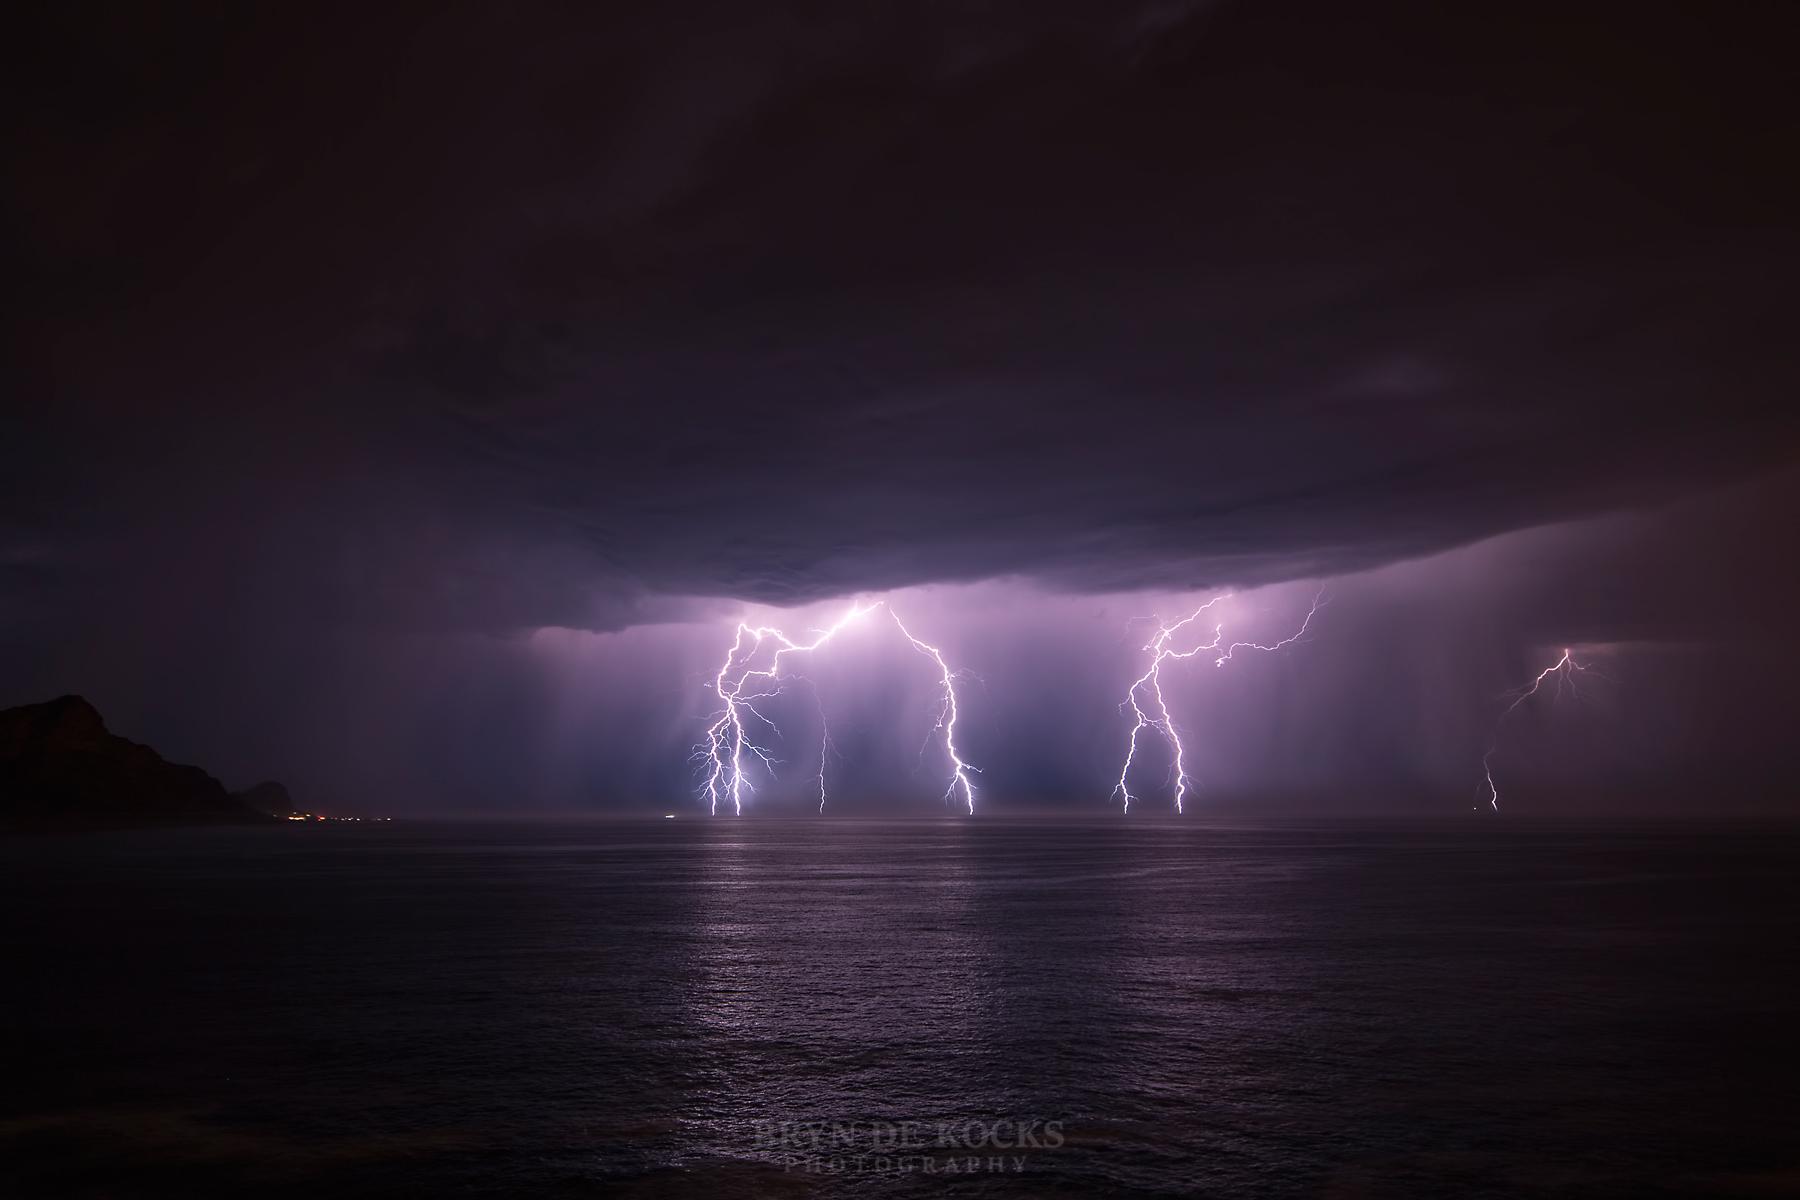 kogelbaai lightning strikes